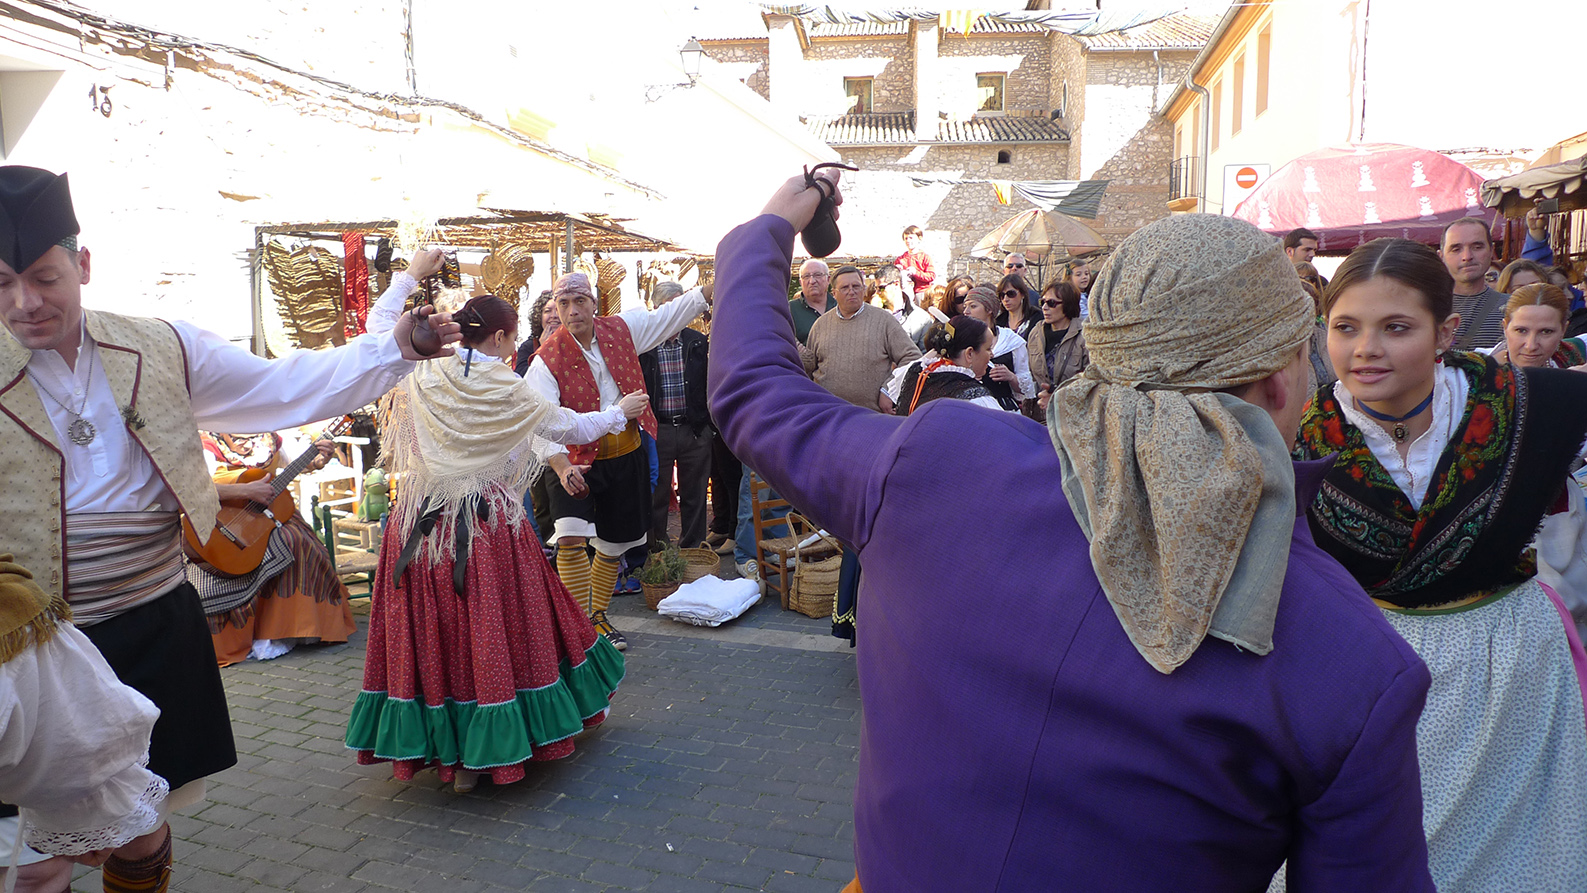 2014-02-23 - Baladre a Fira St. Marcia-ROTOVA (62)